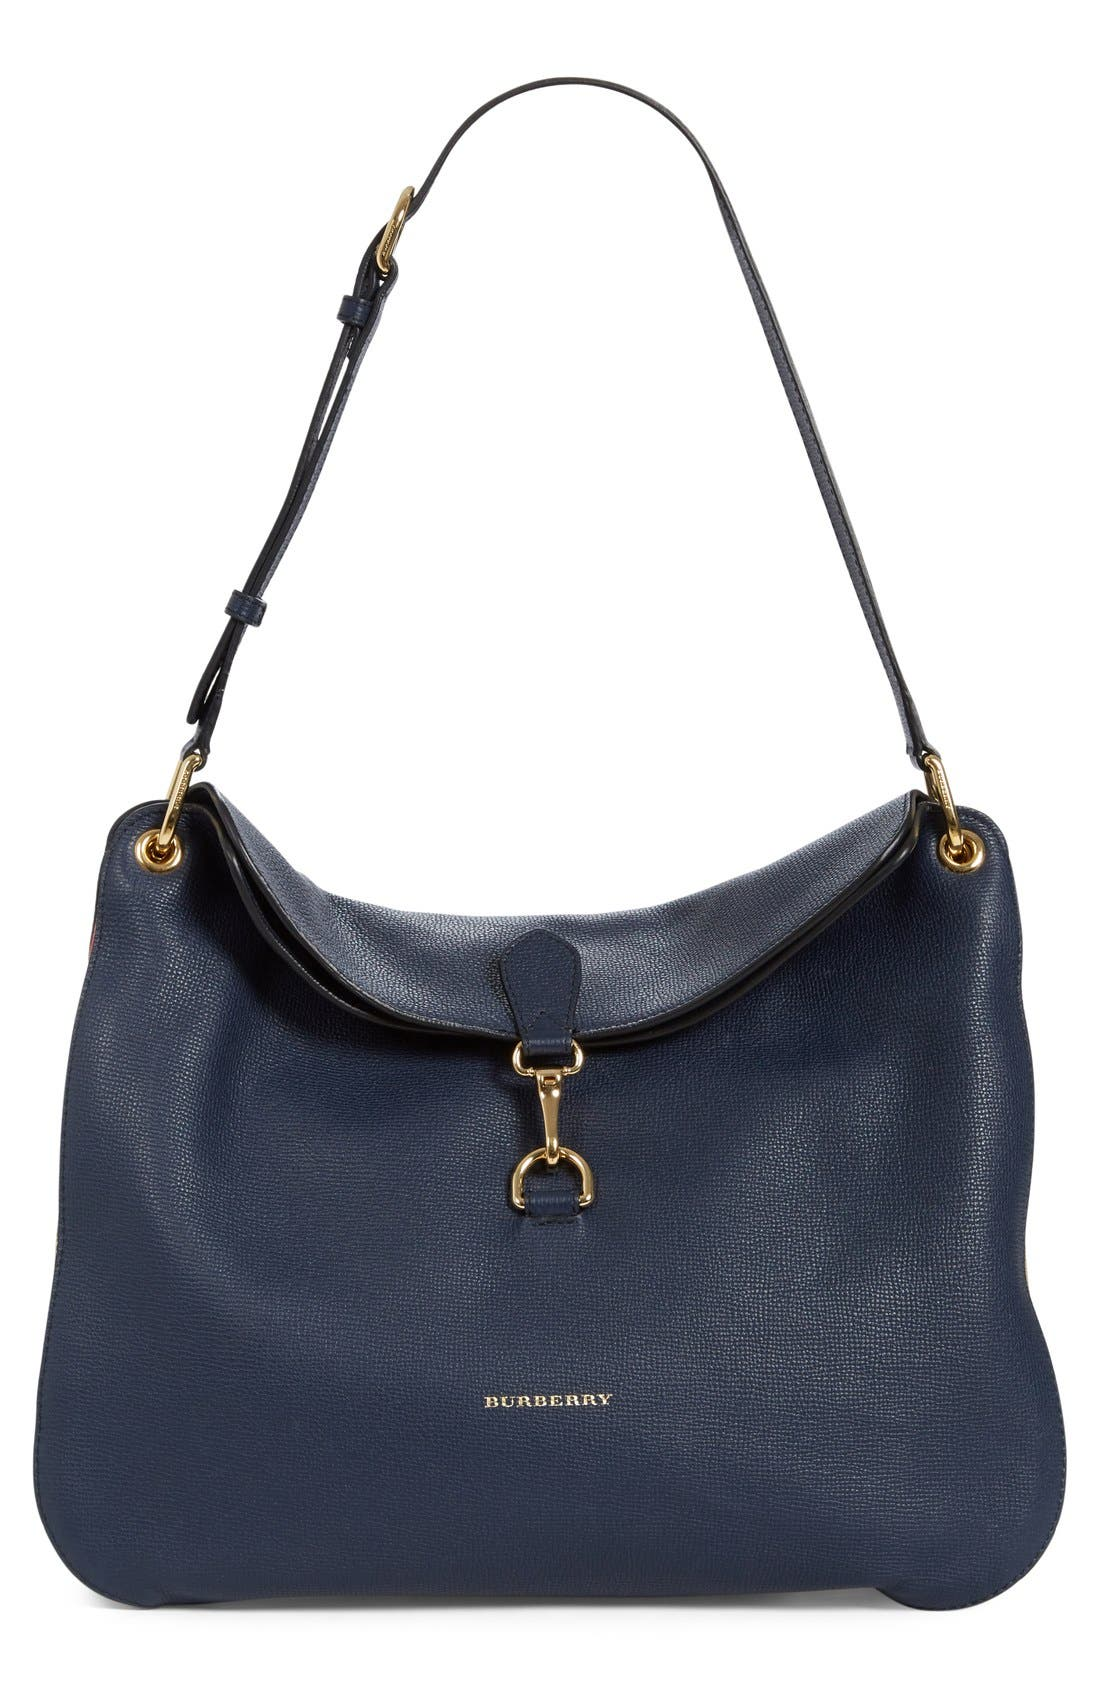 Alternate Image 1 Selected - Burberry 'Medium Cornwall' Shoulder Bag